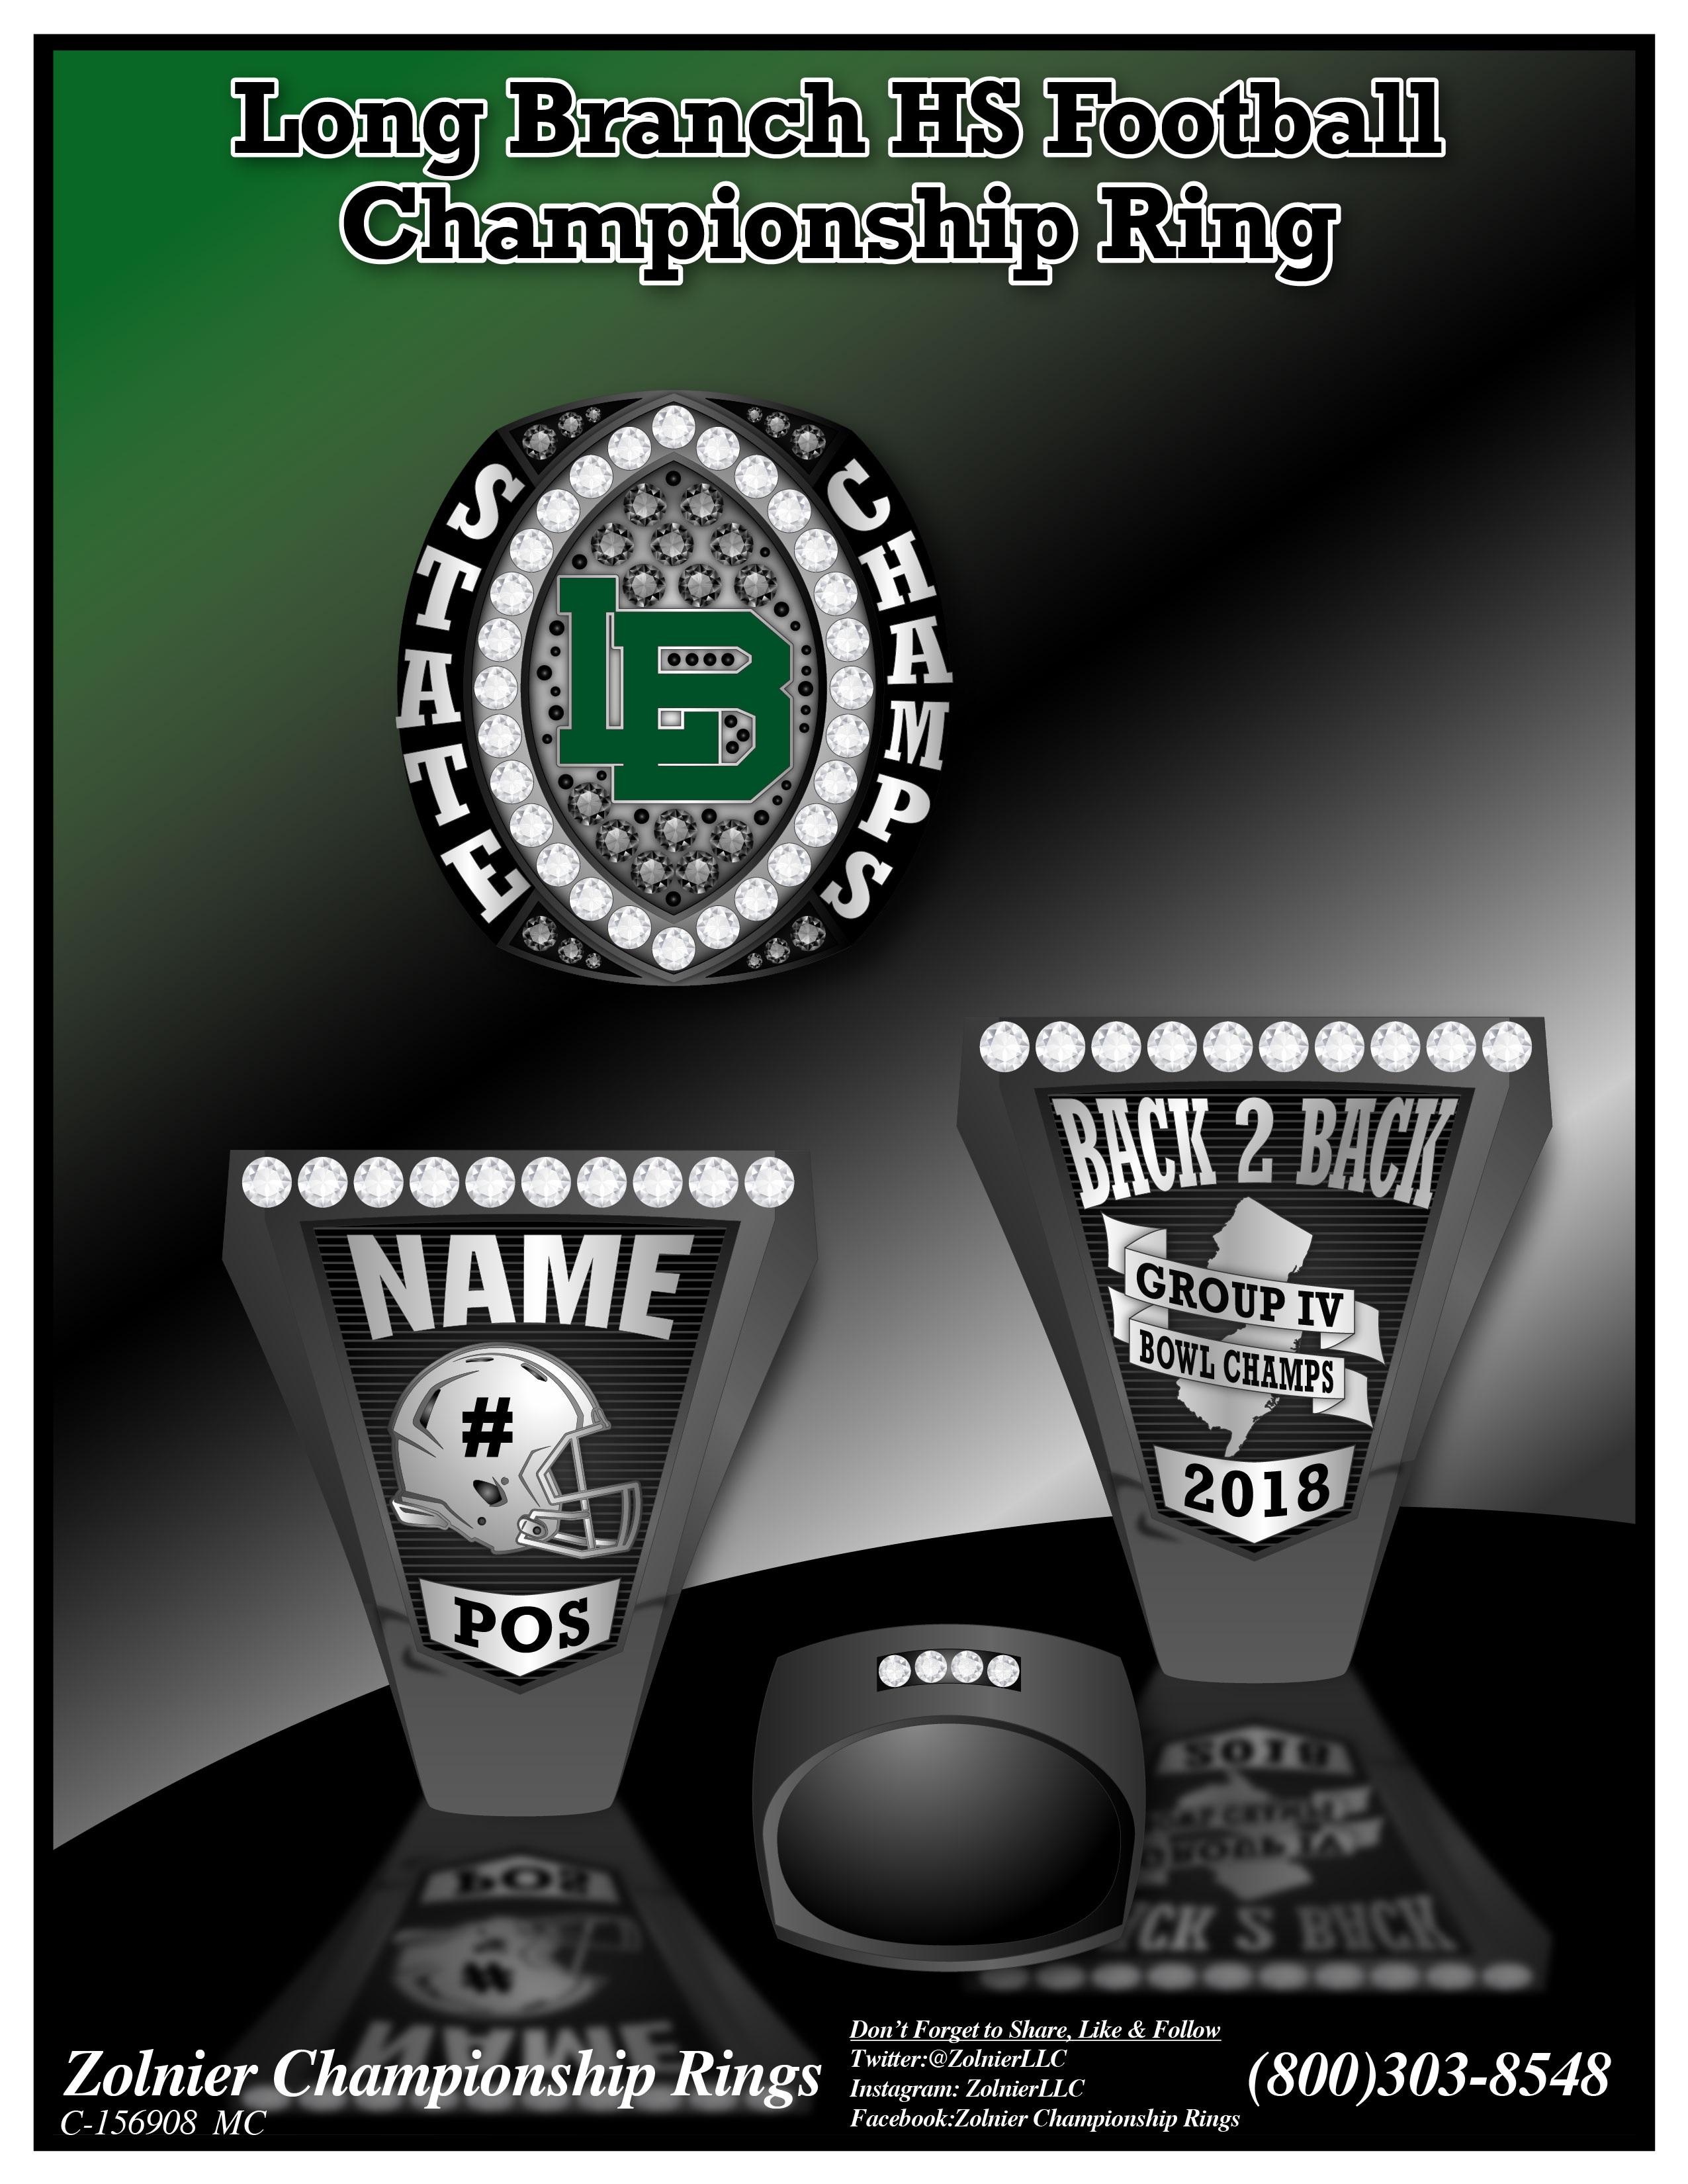 C-156908 Long Branch HS Football Champ Ring